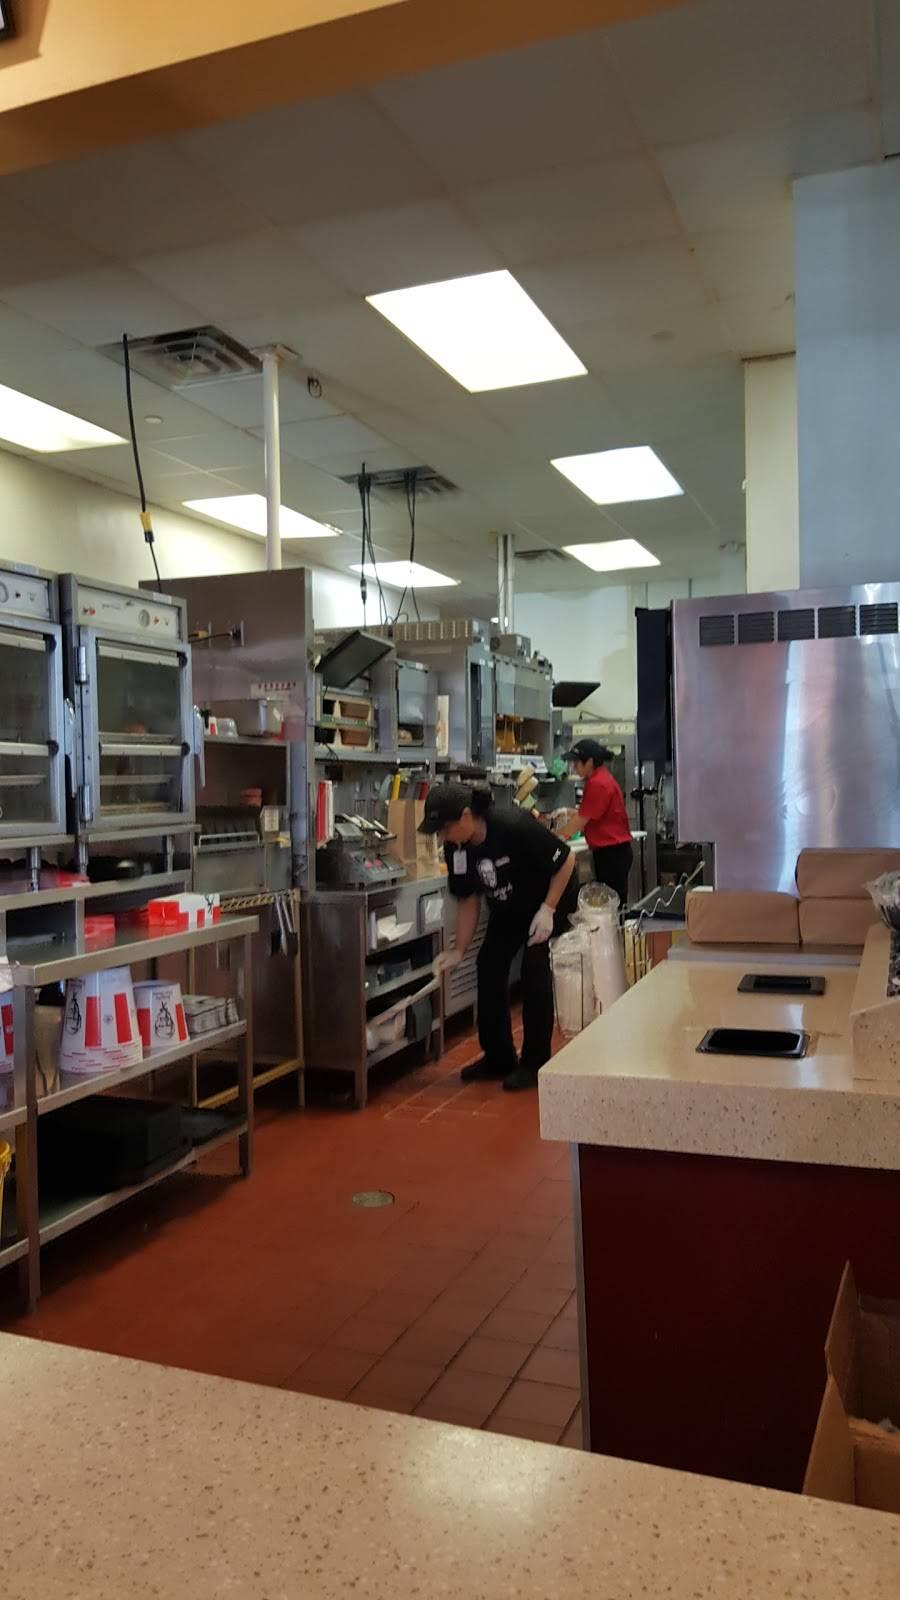 KFC | restaurant | 208 McGuinness Blvd, Brooklyn, NY 11222, USA | 7183836666 OR +1 718-383-6666